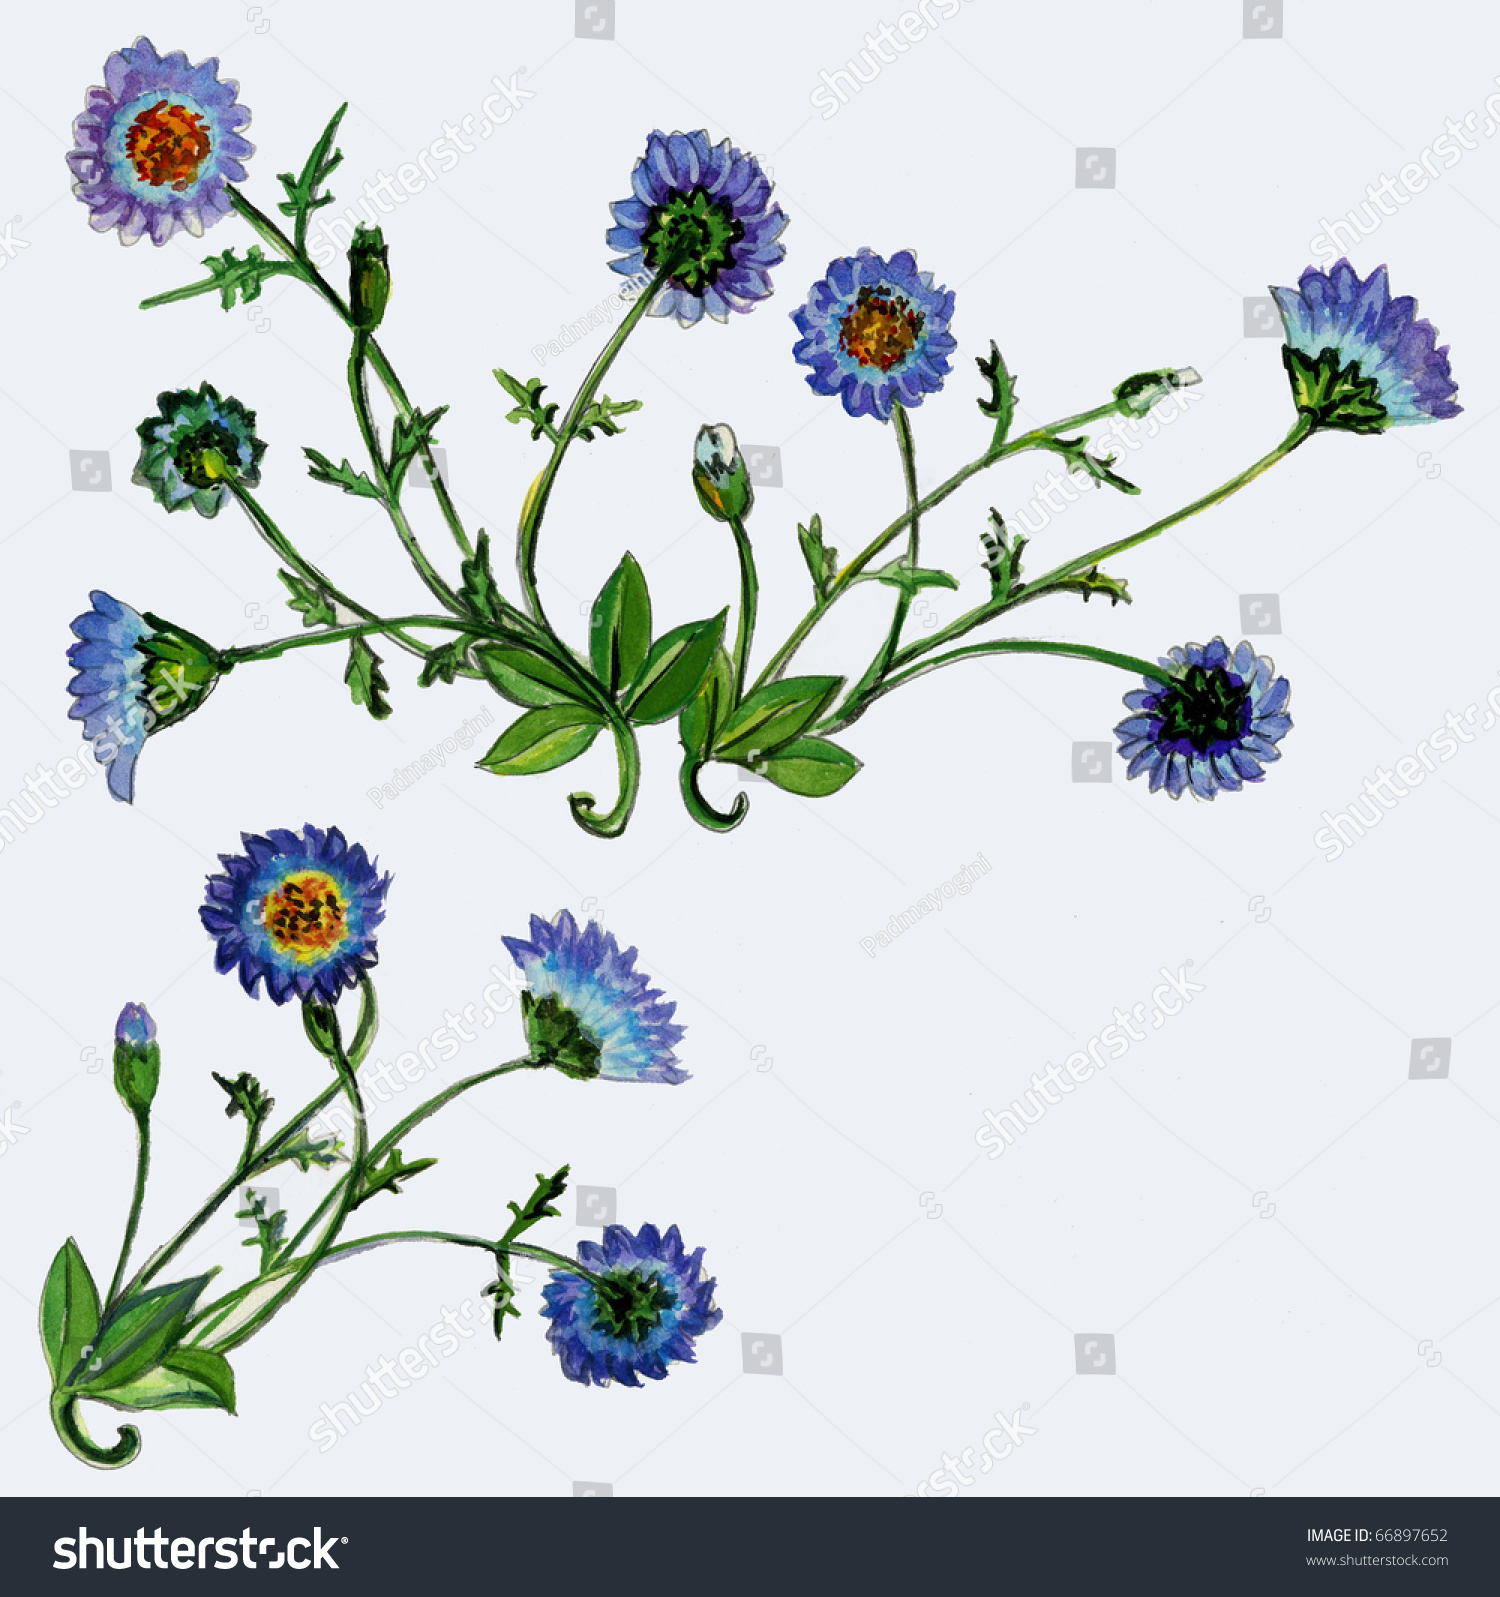 Illustration Two Daisy Plants Blue White Stock Illustration 66897652